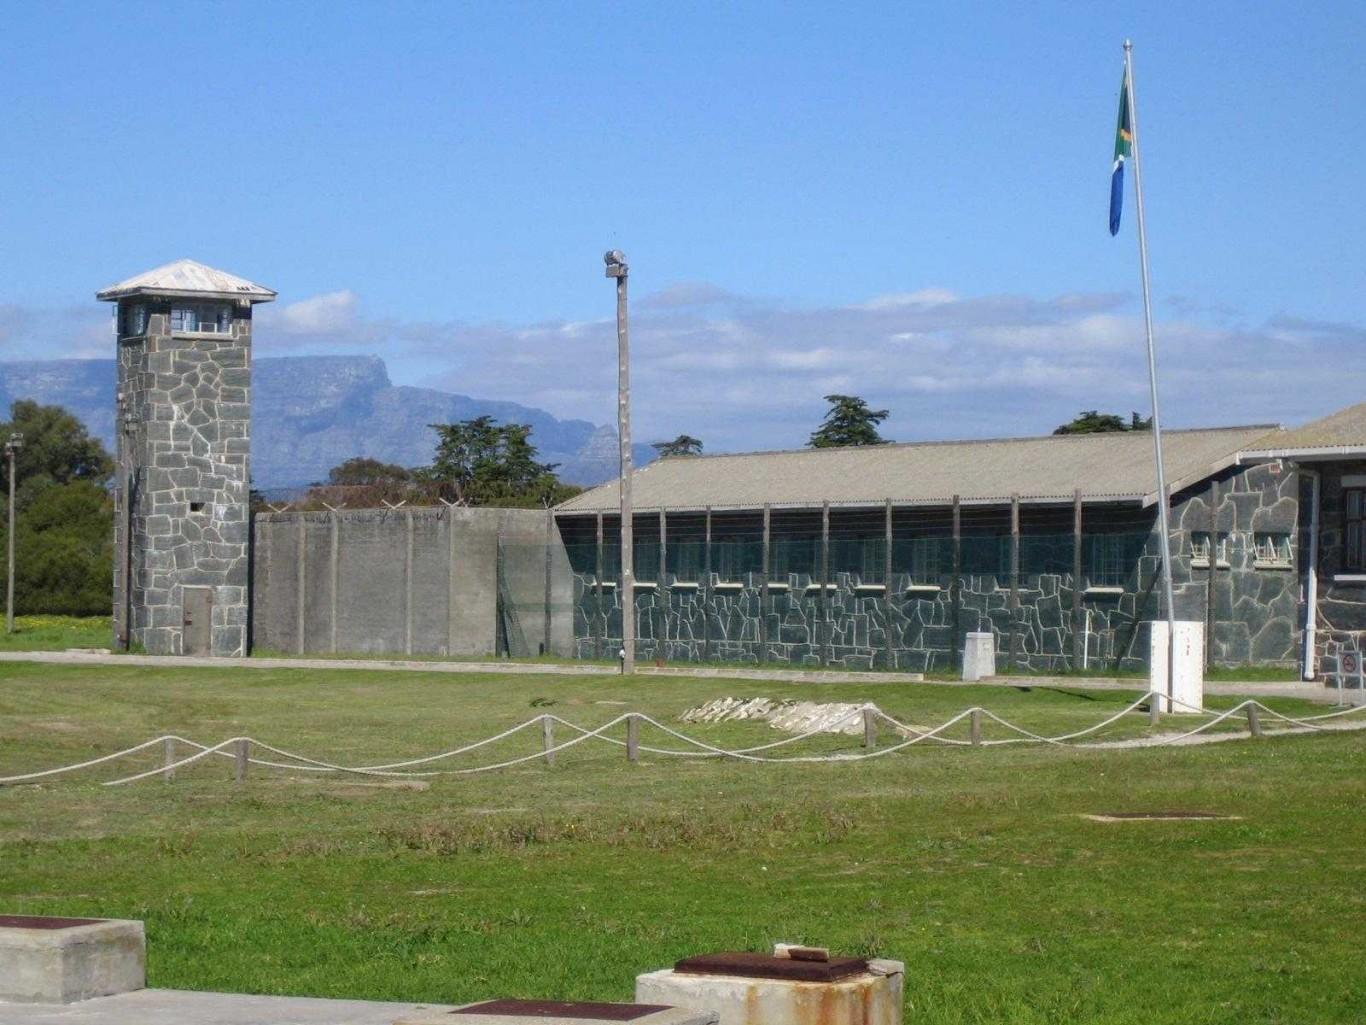 robben-island-prison-south-africa